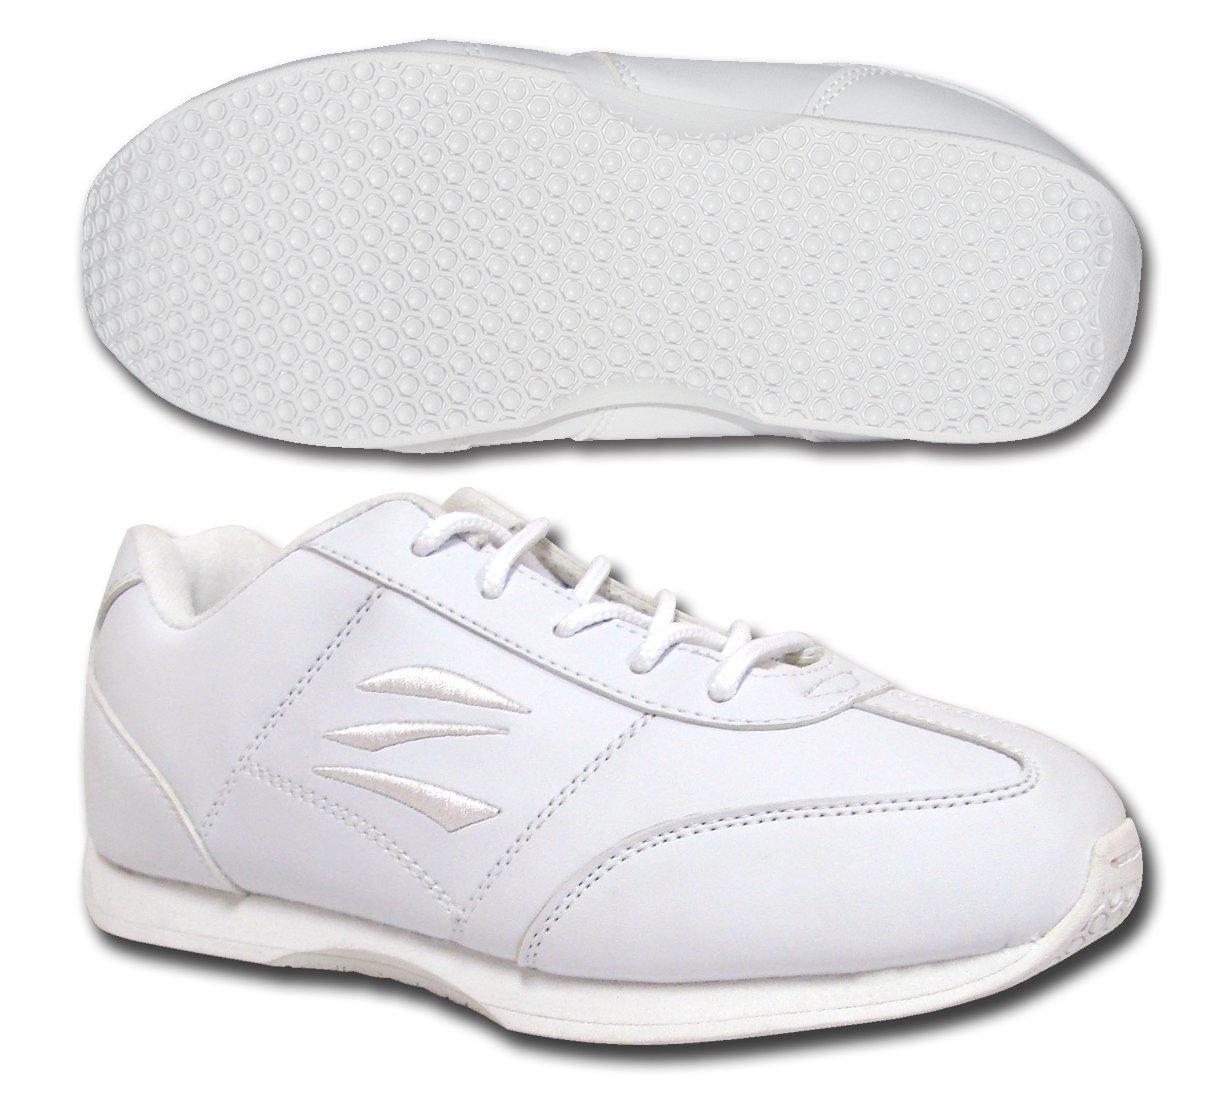 ff522f58b8dd Best Rated in Cheerleading Footwear   Helpful Customer Reviews ...